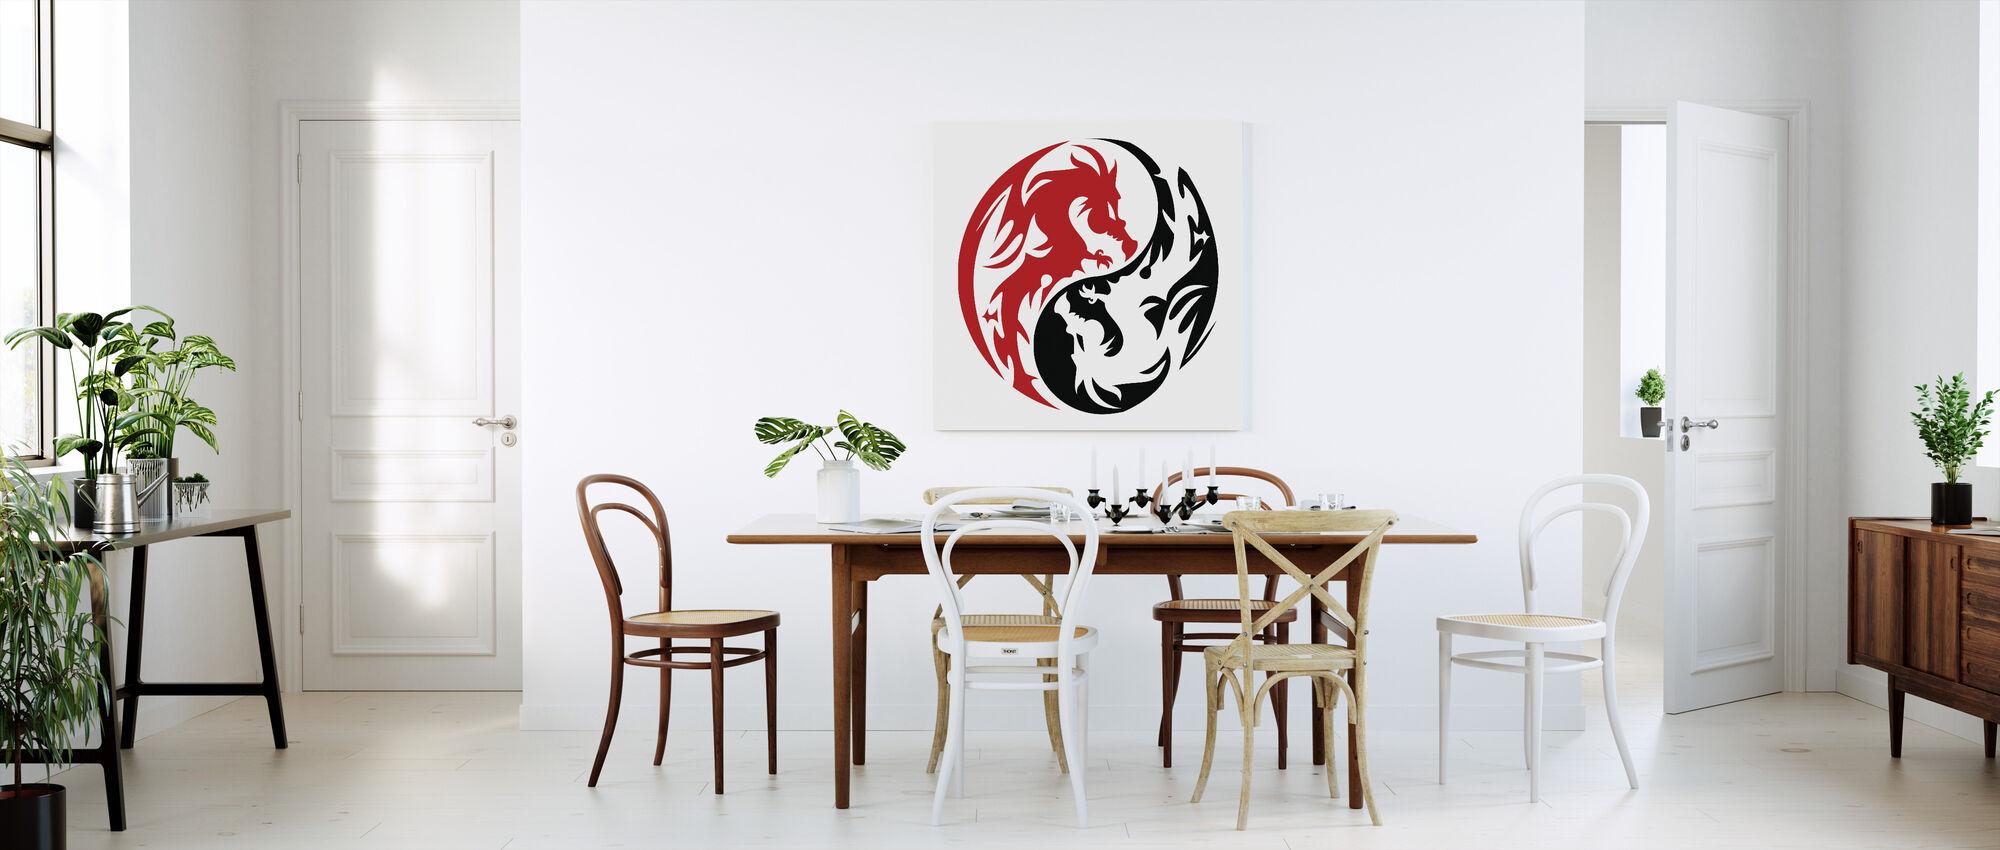 Circle Dragons - Red - Canvas print - Kitchen